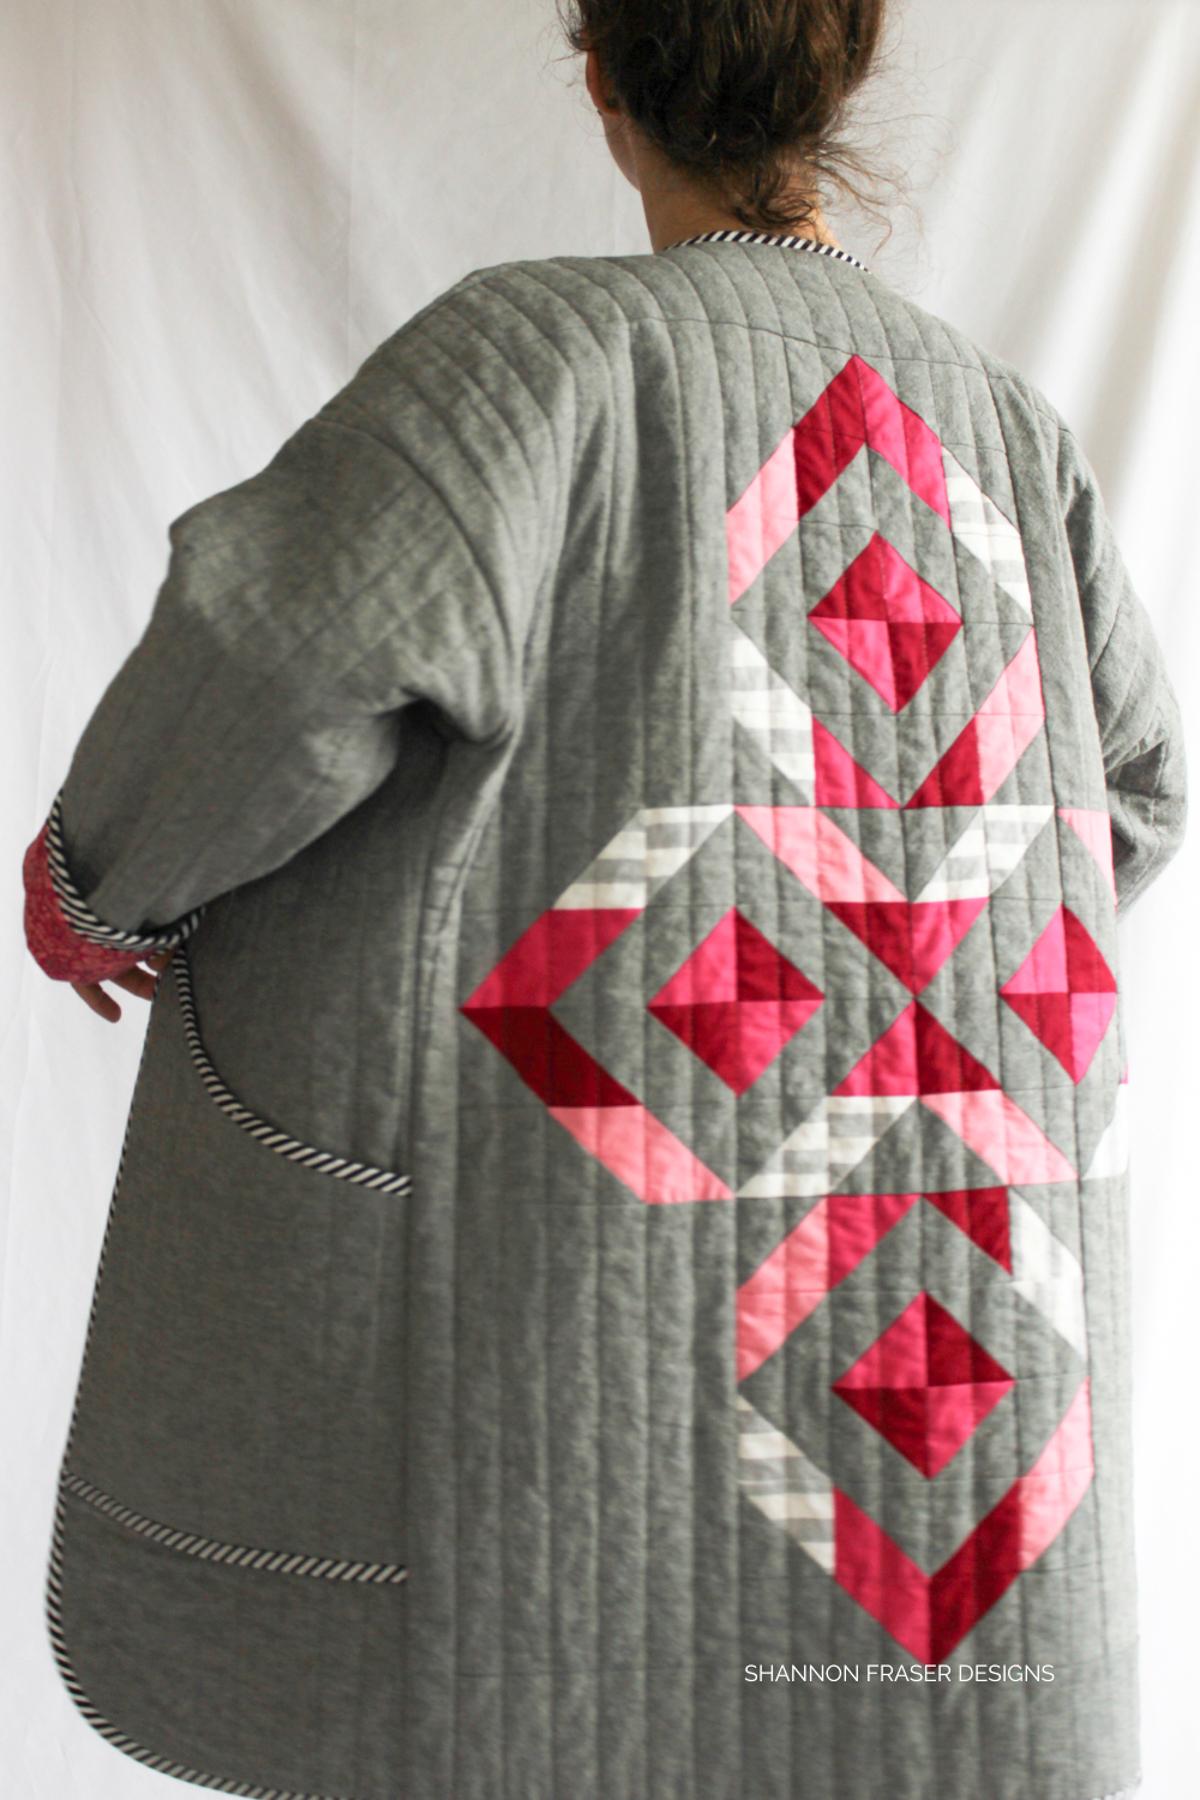 Shannon Fraser shares 10 tips for beginner quilt coat makers | Megan Nielsen Patterns